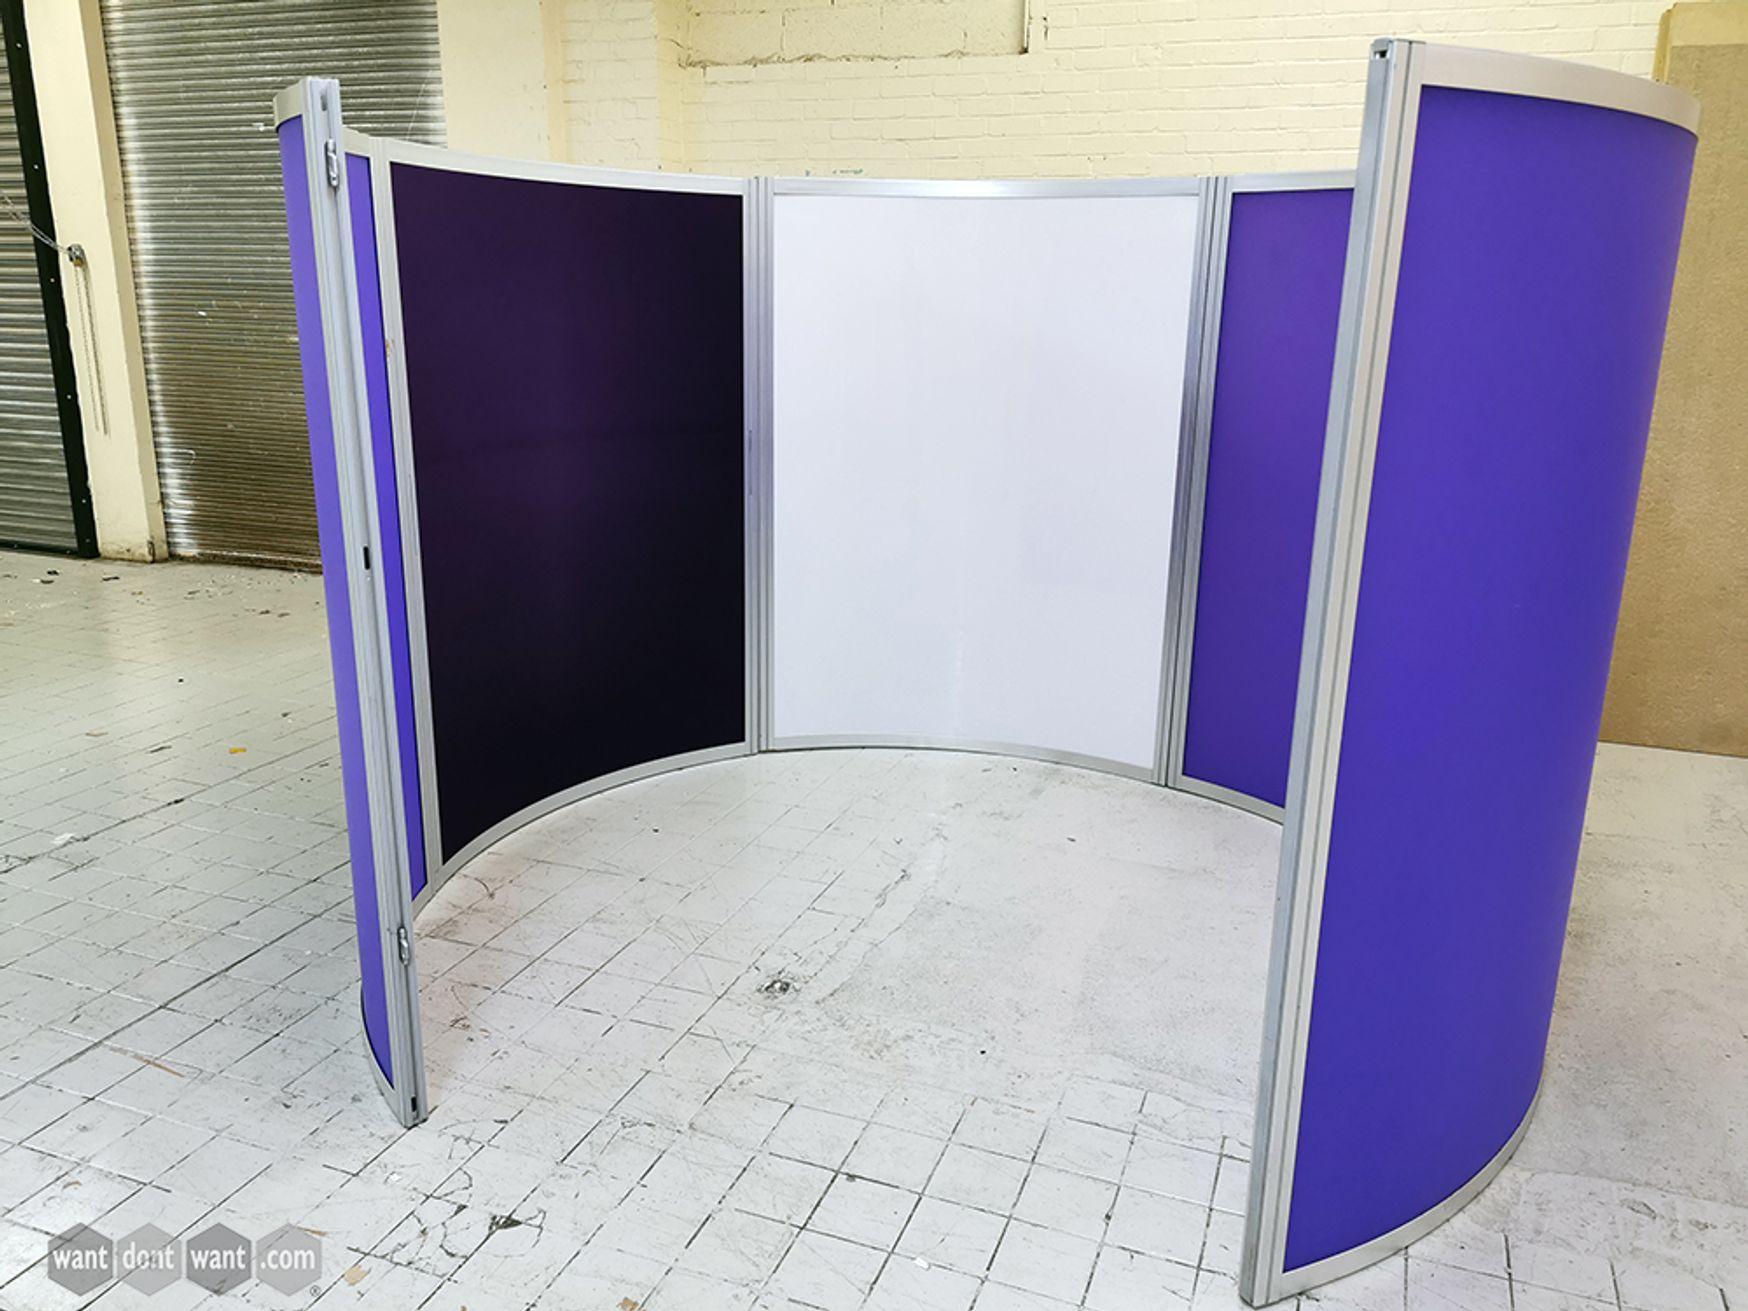 Used Orangebox 'Cove' C Shaped Screen System